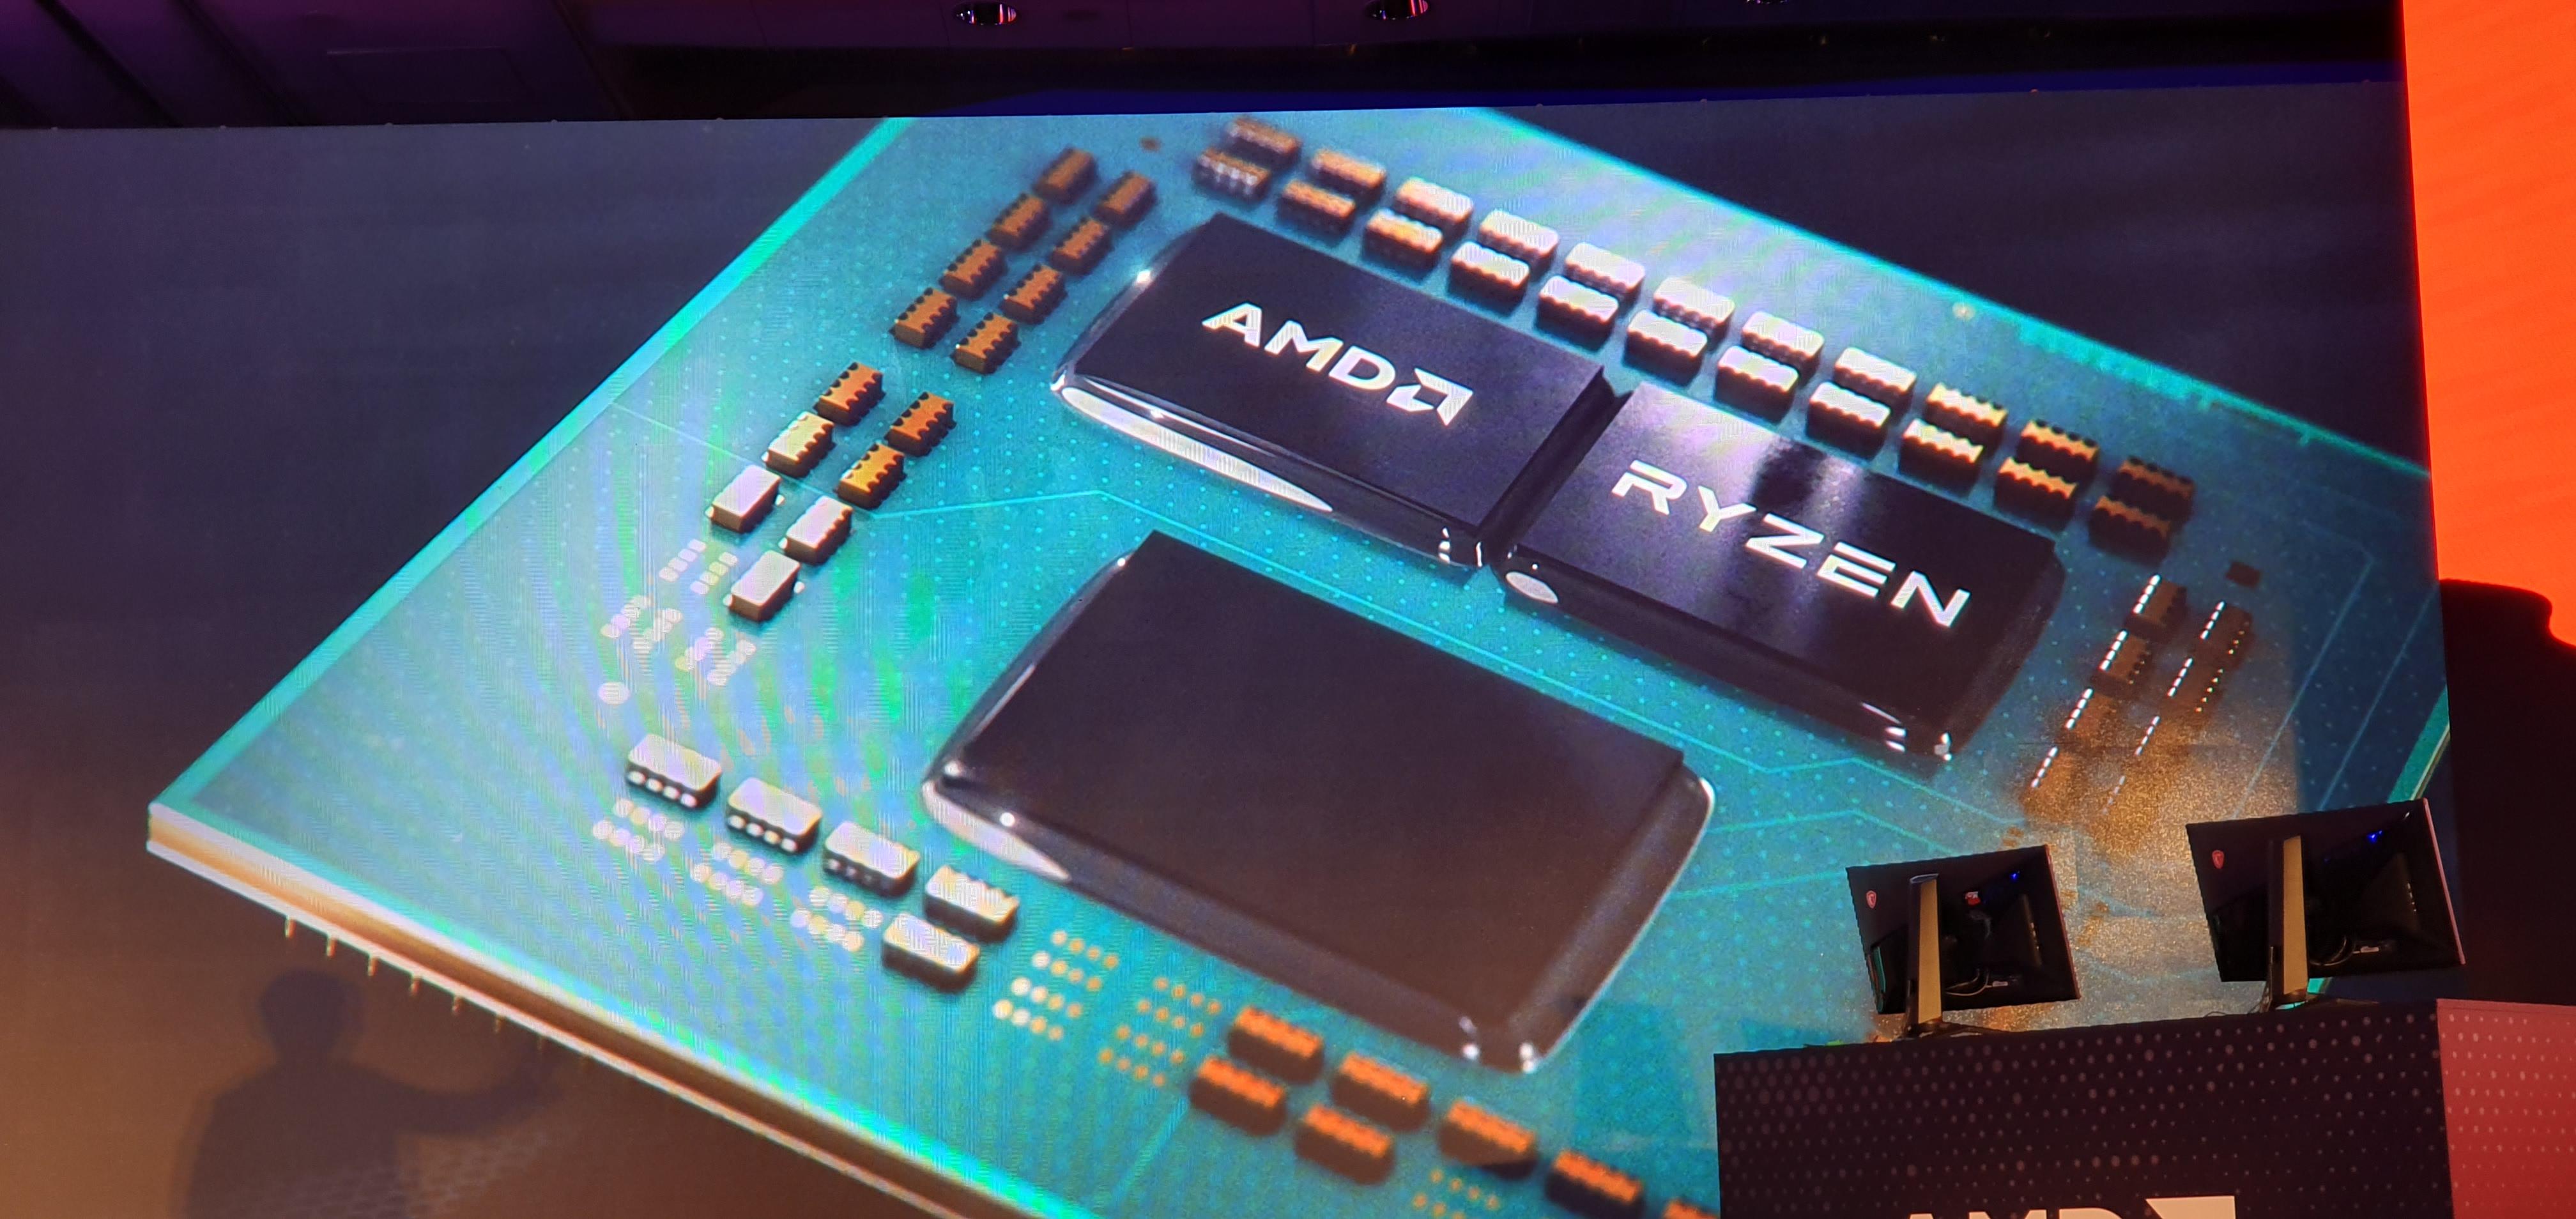 Amd Ryzen 3000 Announced 7nm Cpus 12 Cores 4 6 Ghz 499 Us